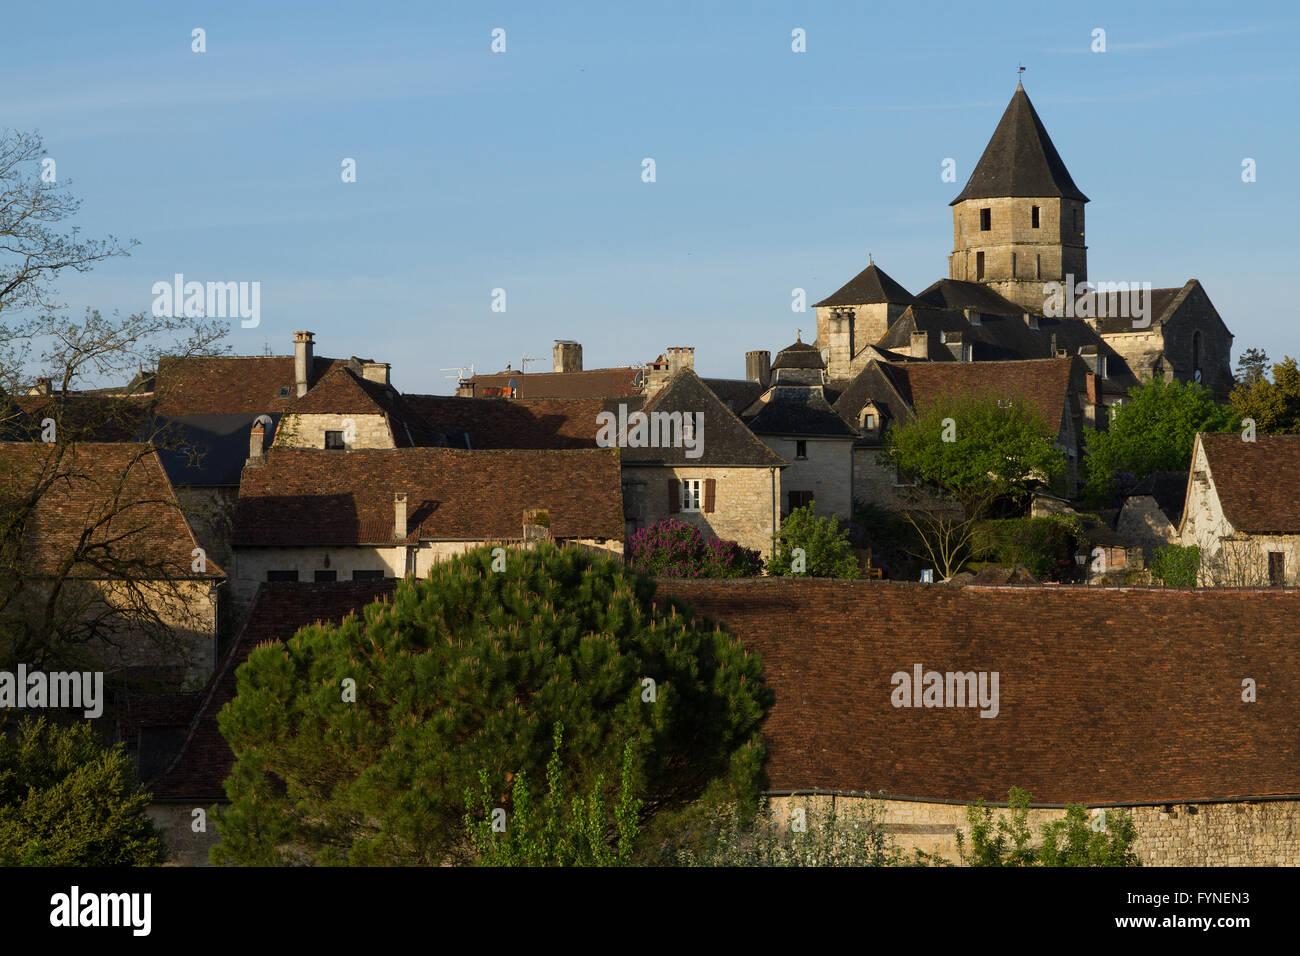 The charming village of Saint Robert Correze France Stock Photo